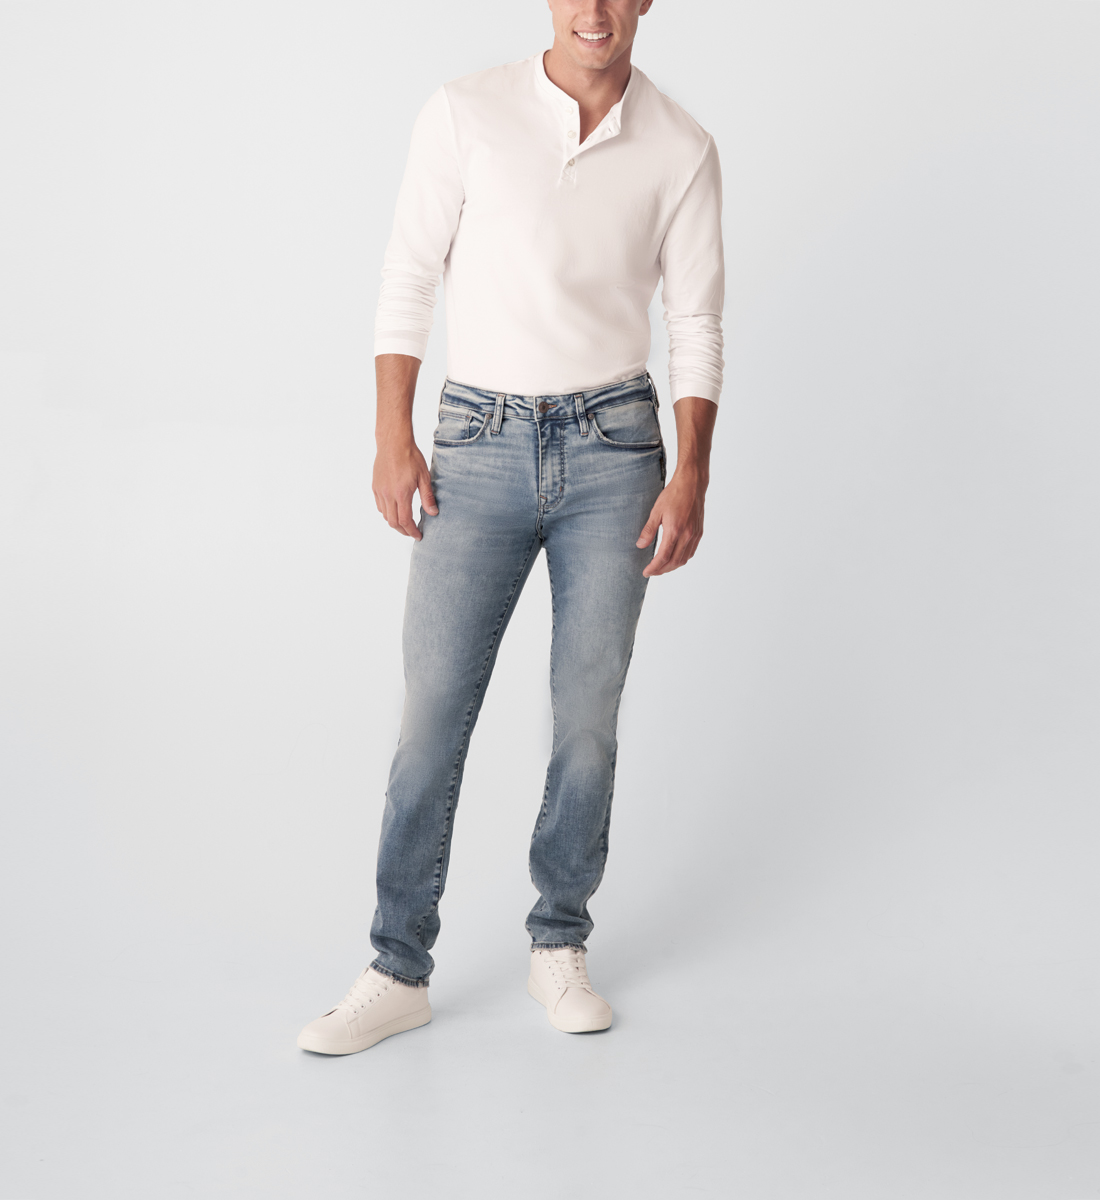 Silver Jeans Kenaston Slim Fit Slim Leg Jeans